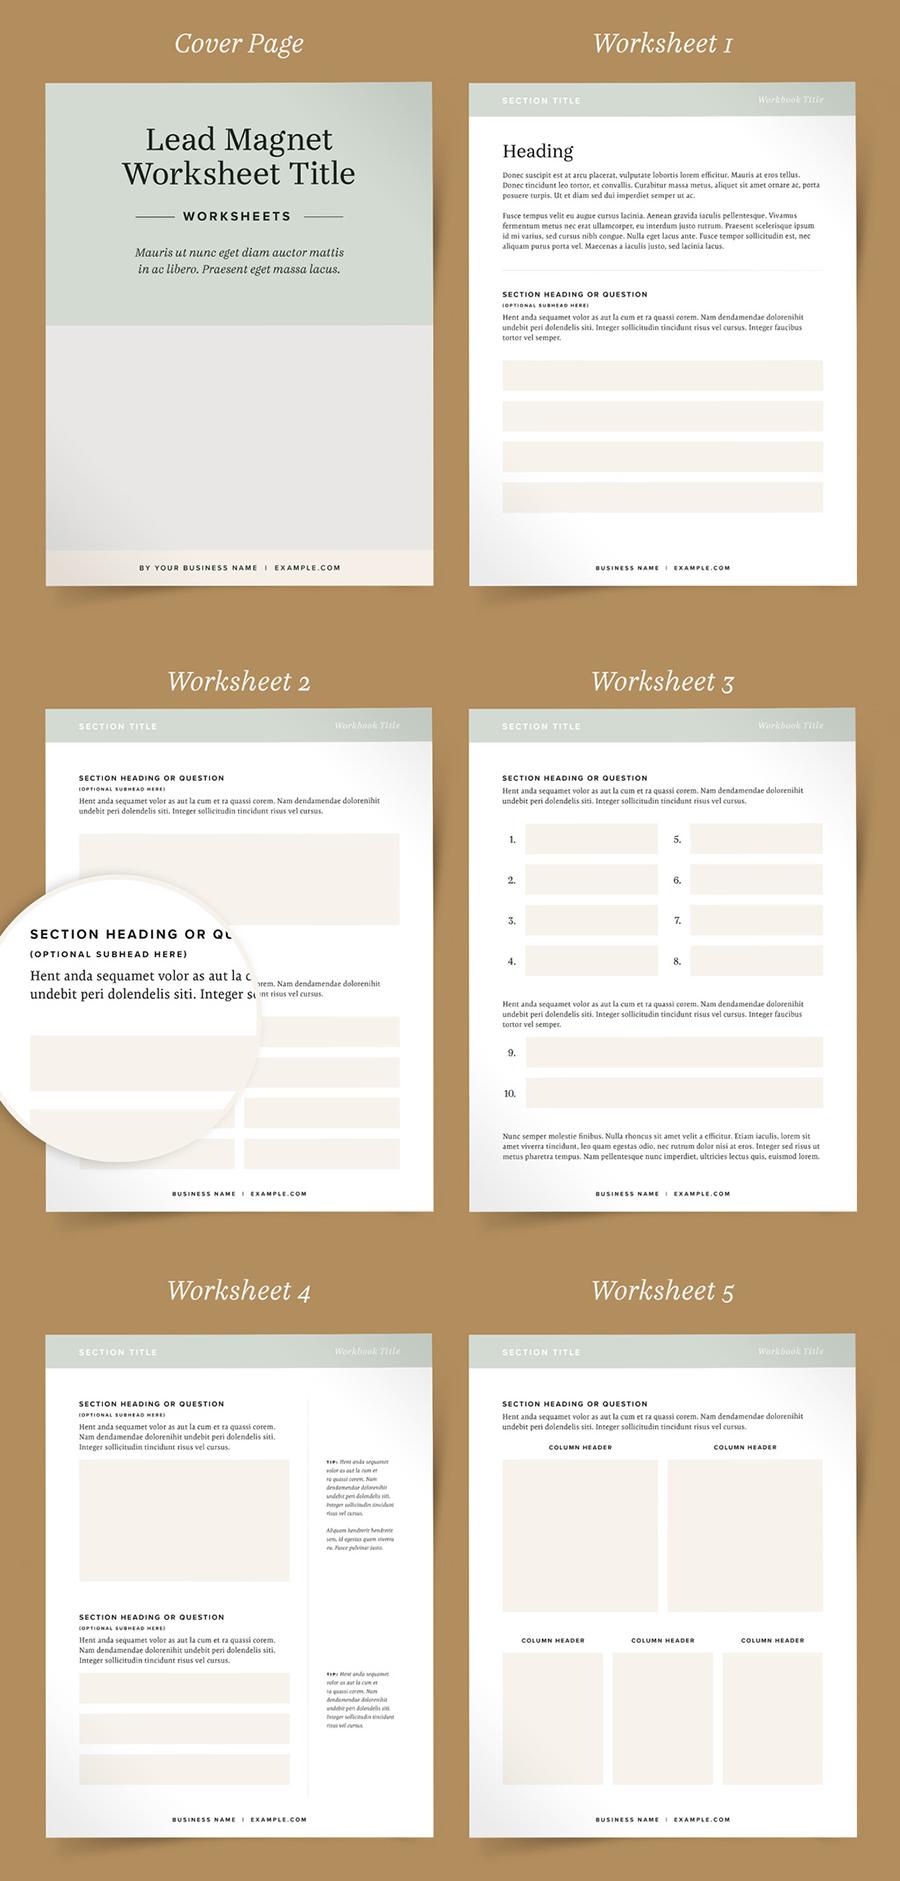 Worksheet Booklet Layouts